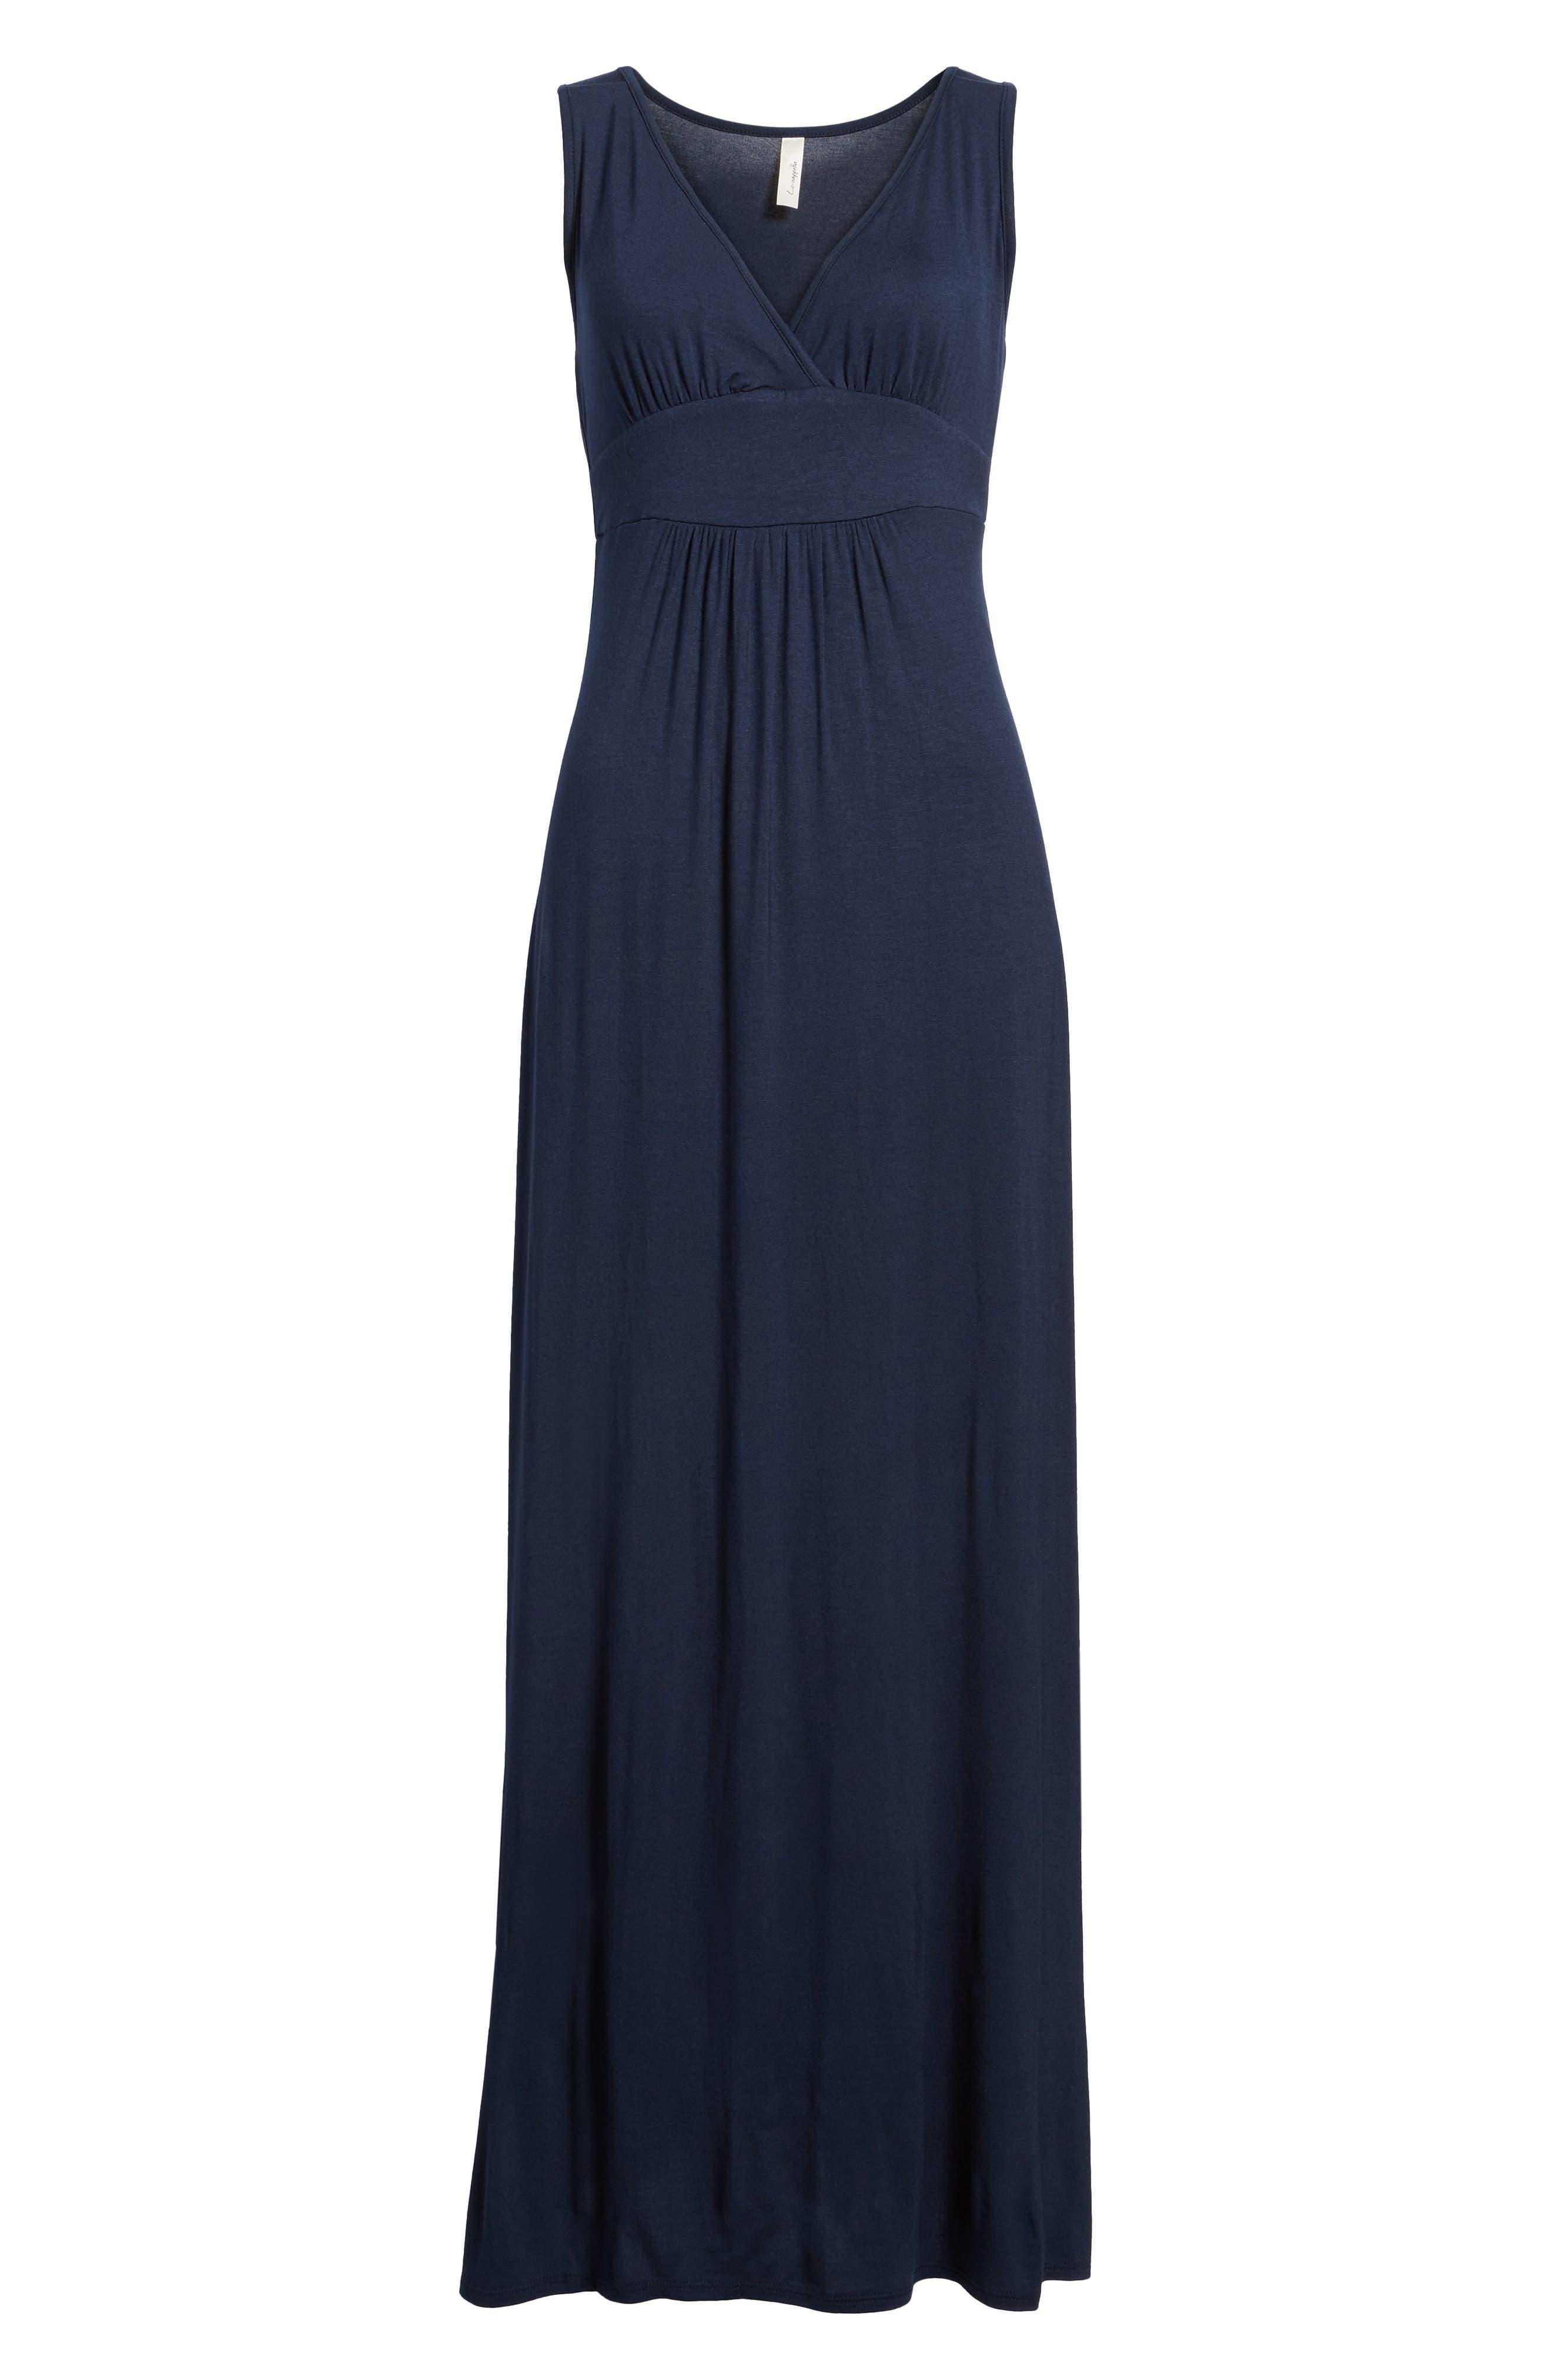 Petite Loveappella V-Neck Jersey Maxi Dress, Blue